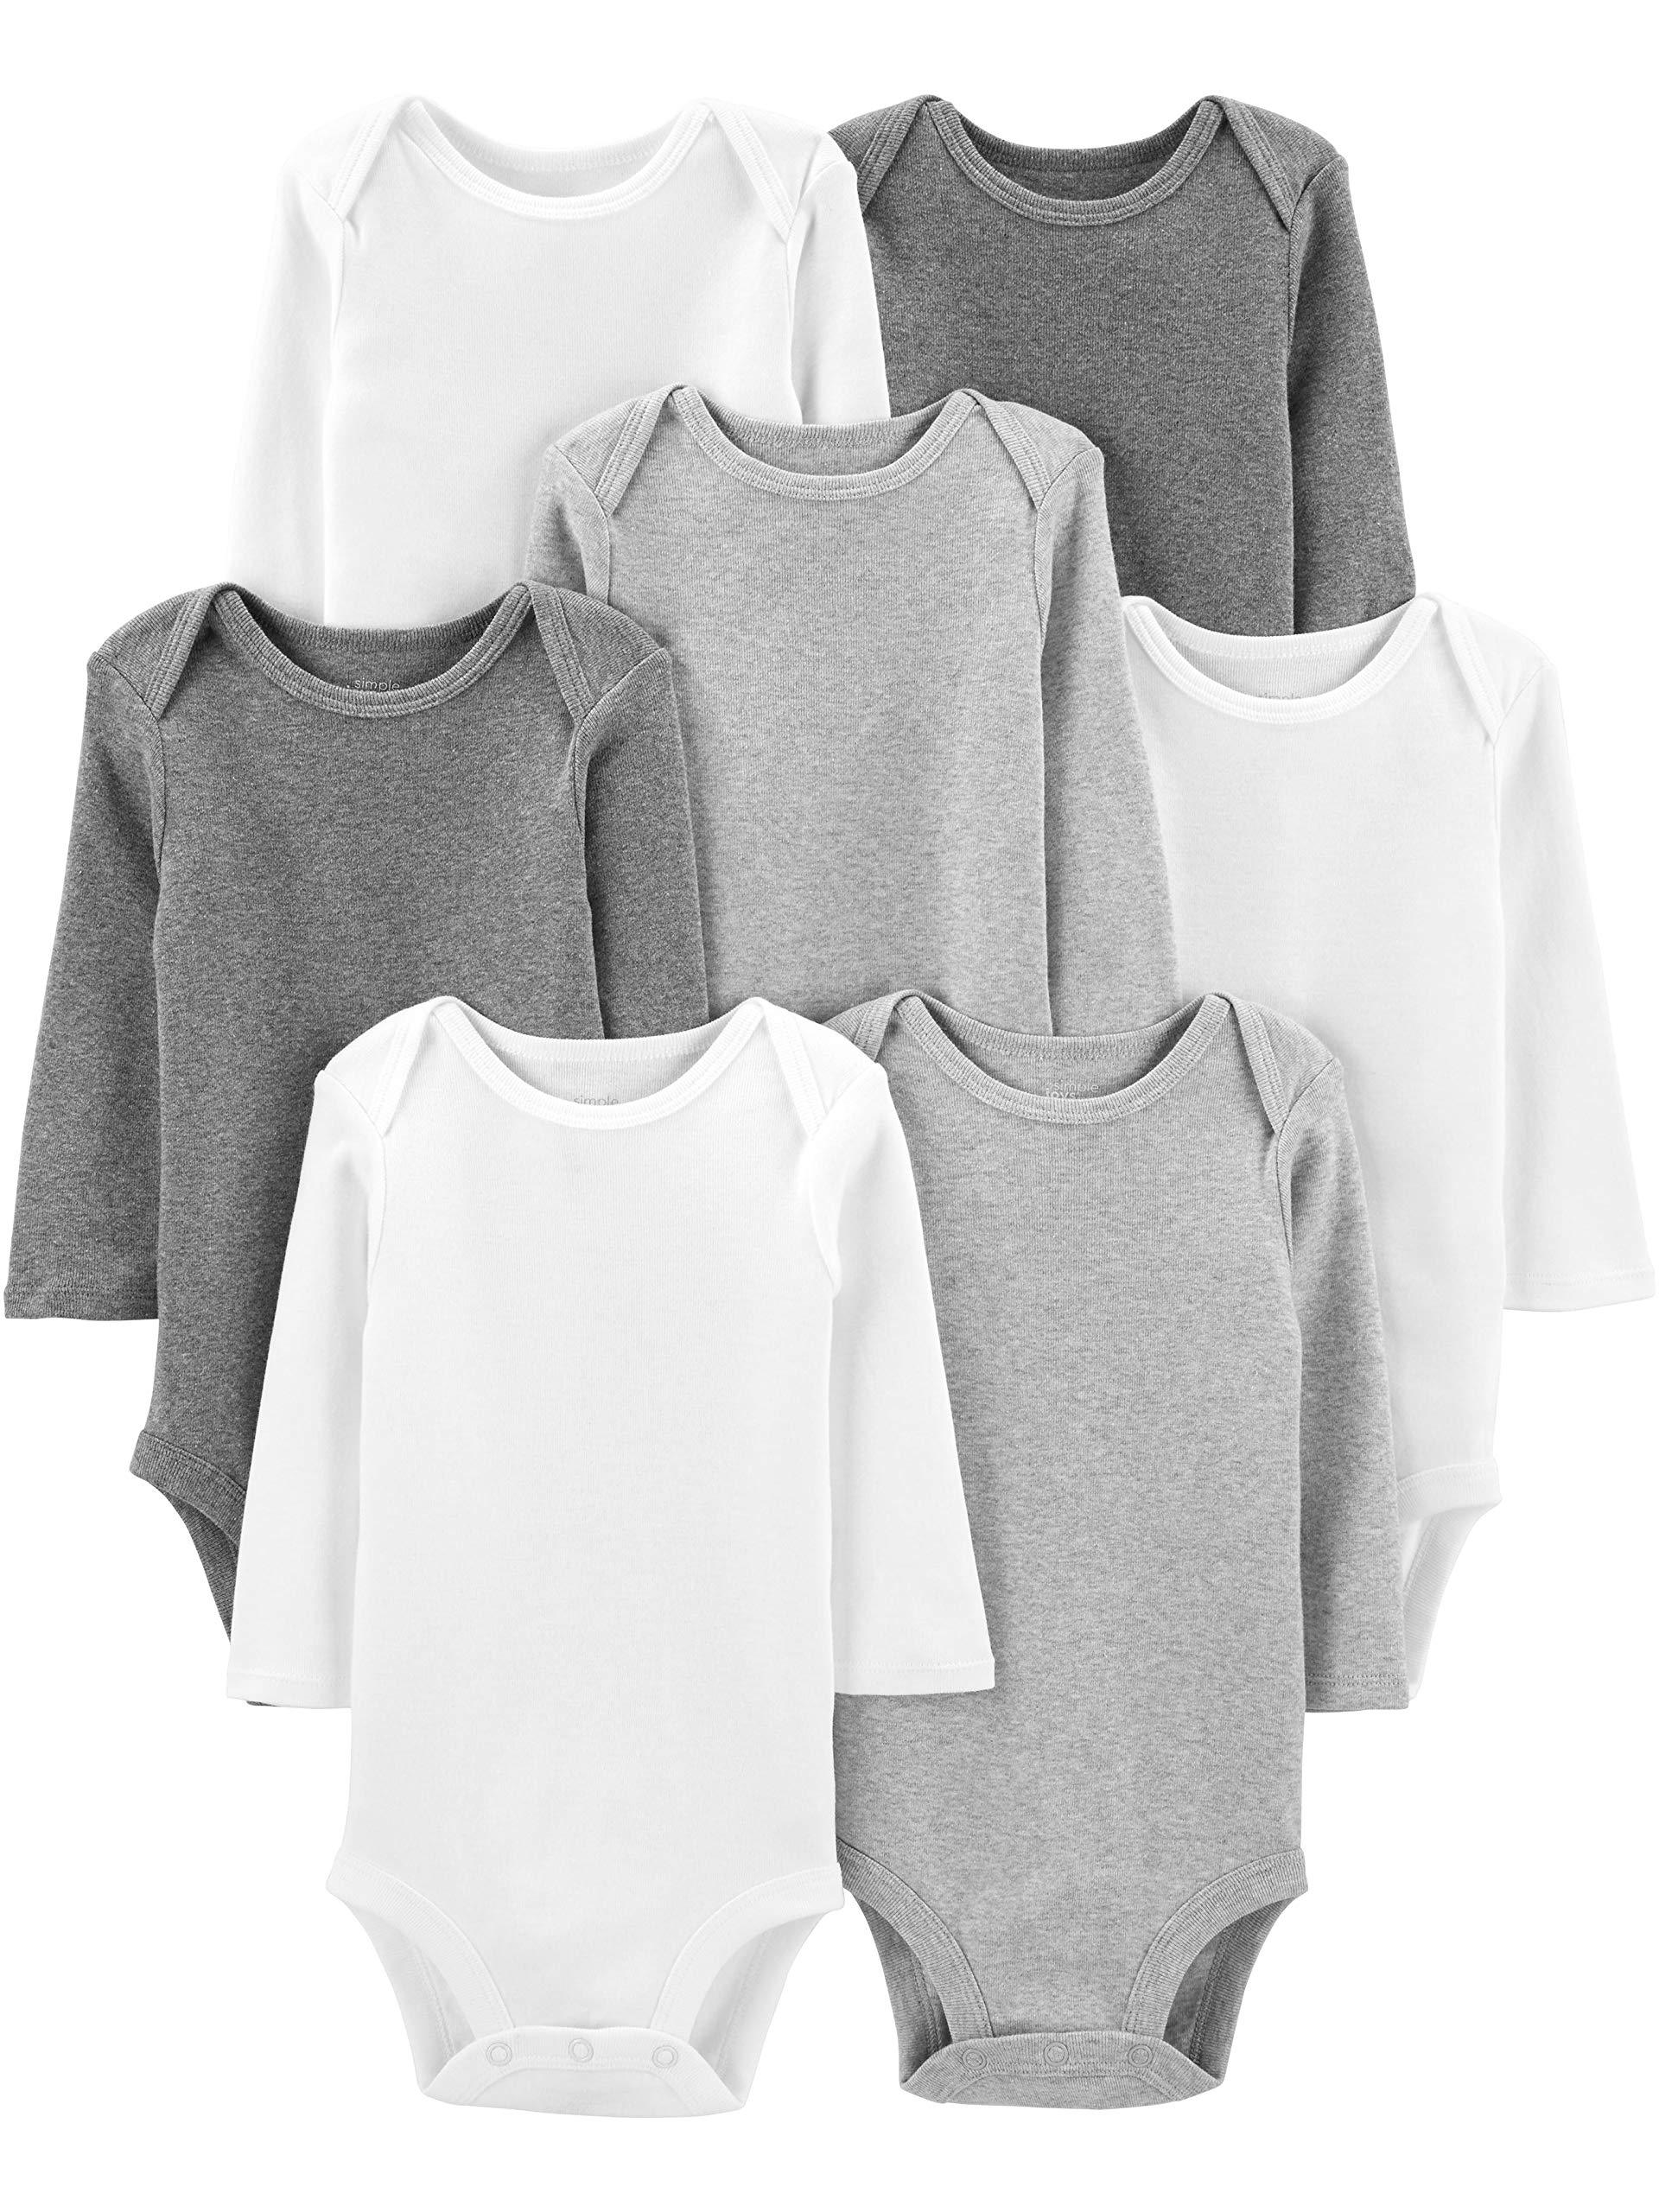 Simple Joys Carters Long Sleeve Bodysuit